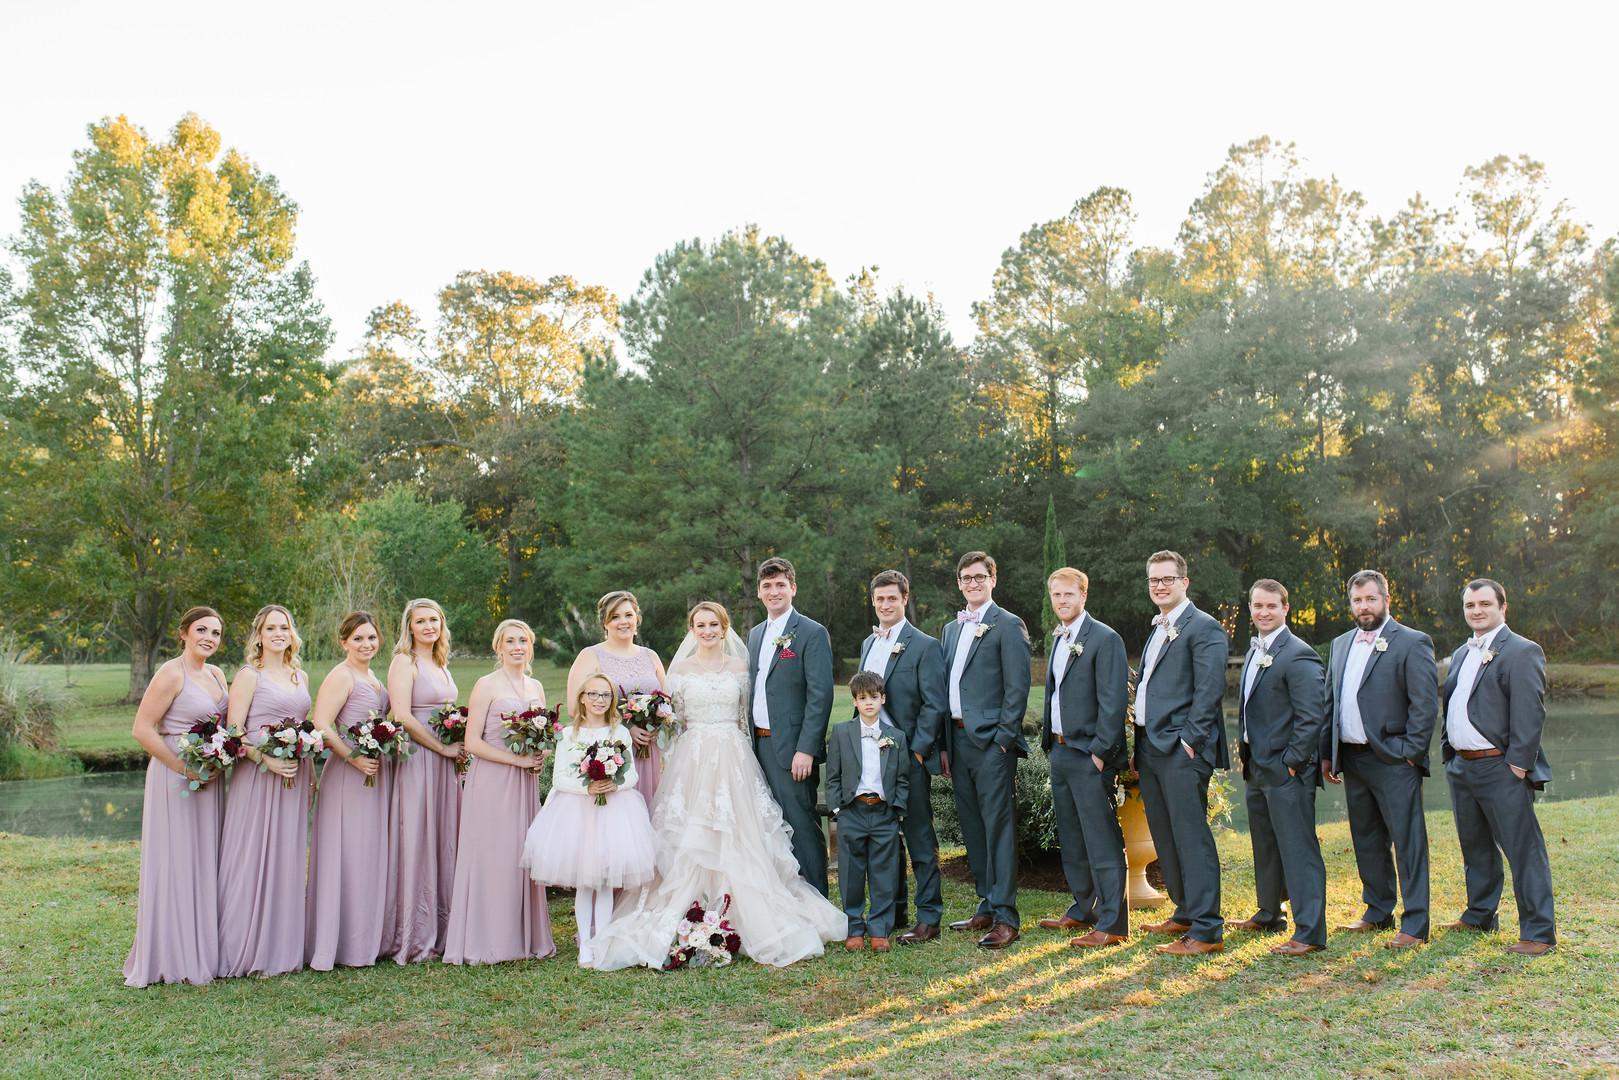 old-wide-awake-plantatin-wedding-1.JPG